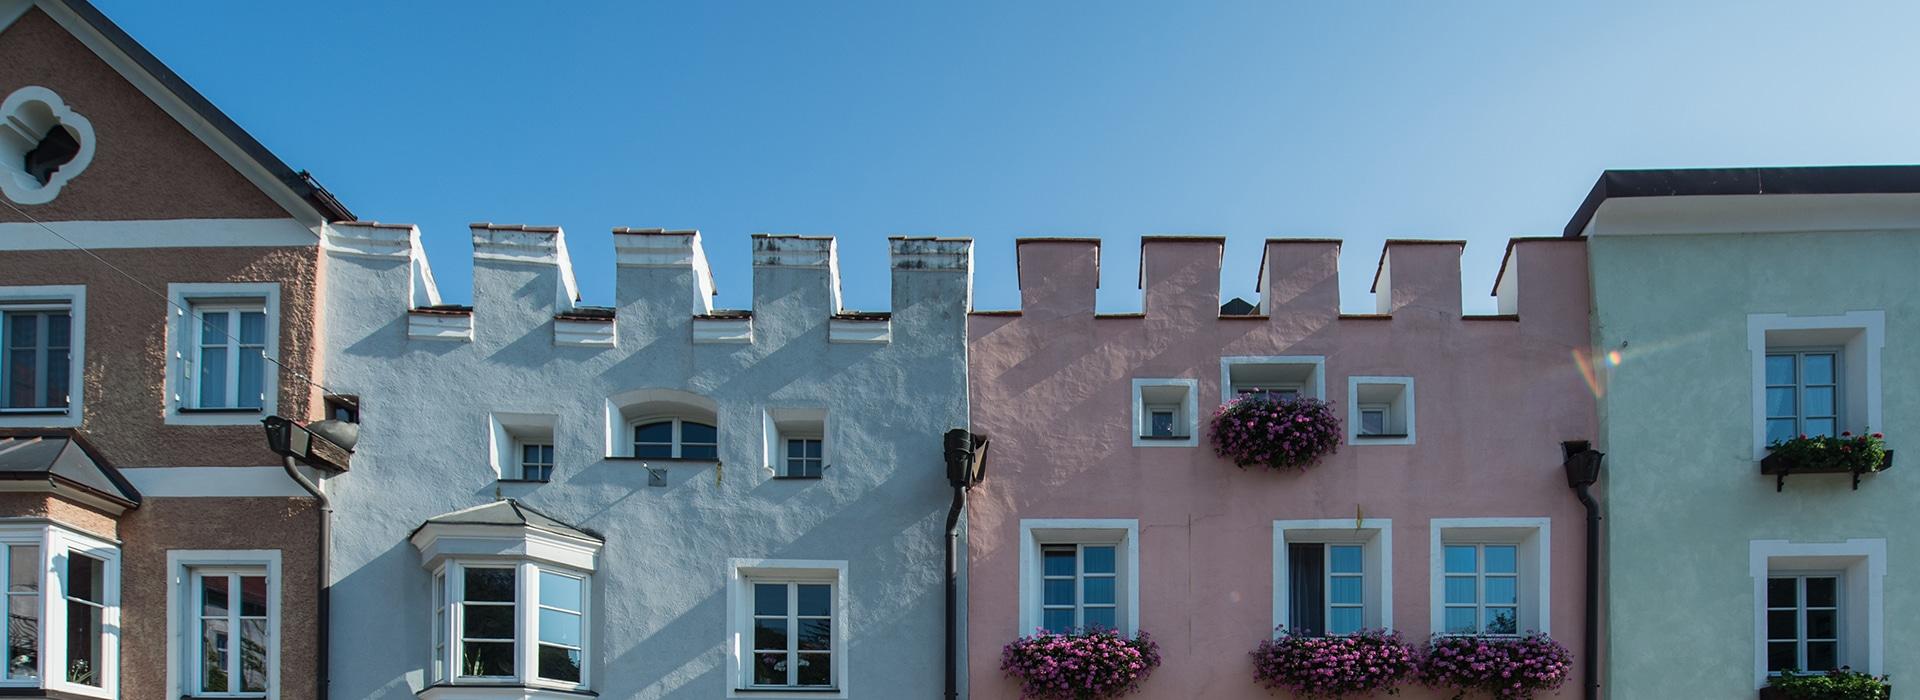 Sommer Stadt ©Harald Wisthaler